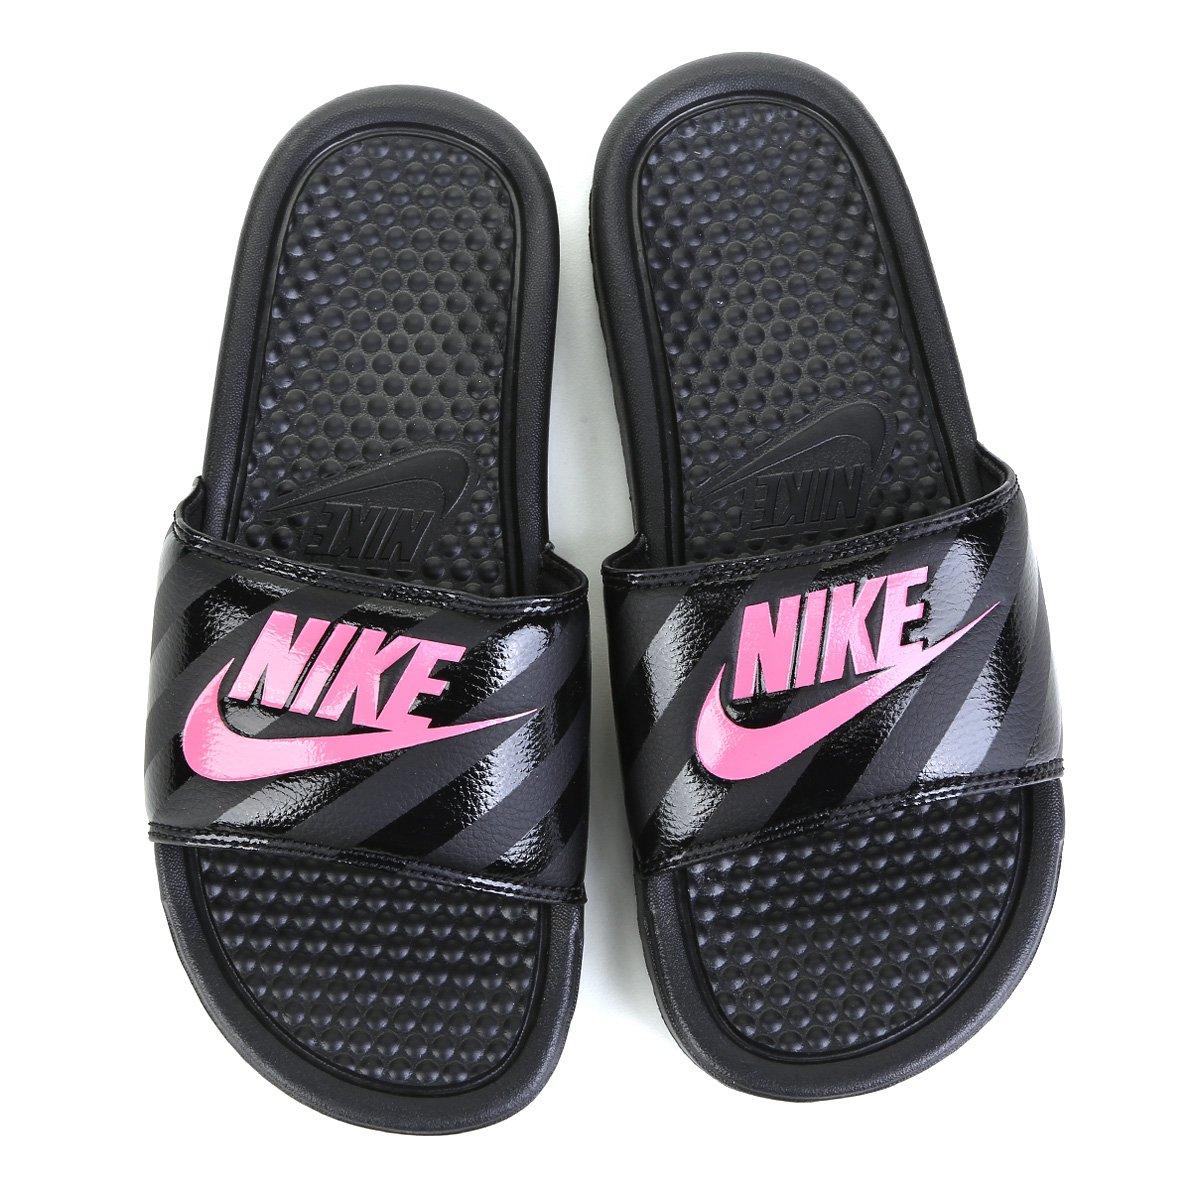 Chinelo Nike Benassi Jdi Slide Feminino Pink E Preto